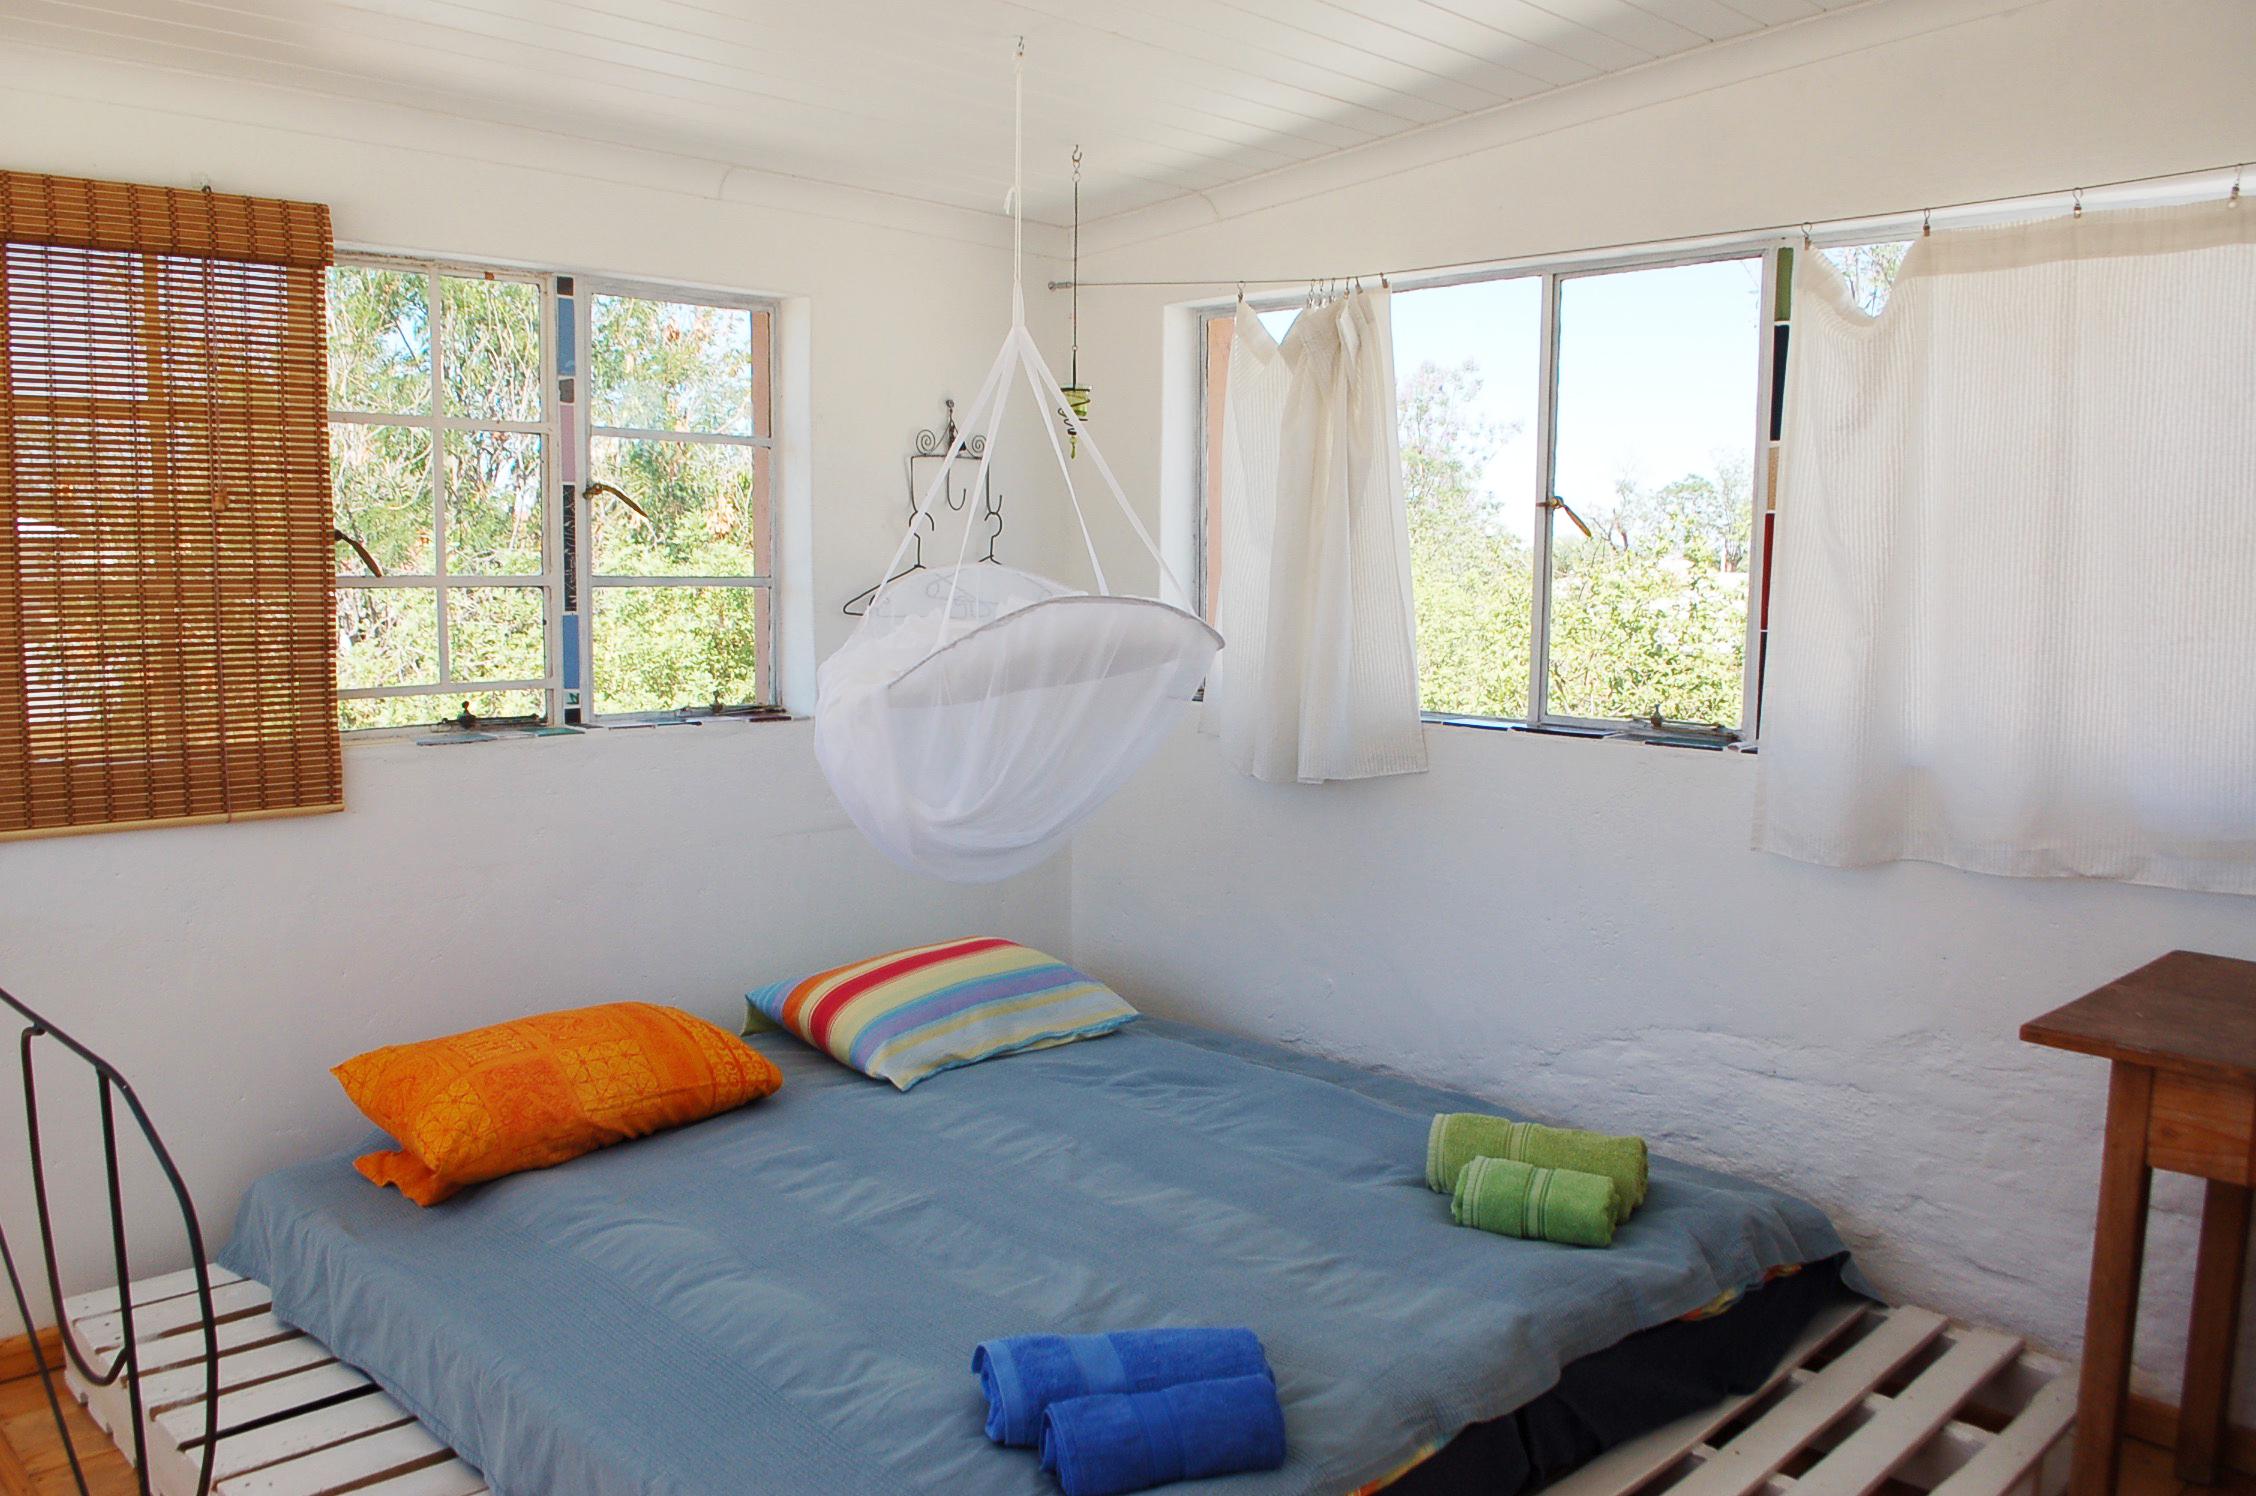 Double-bed in loft